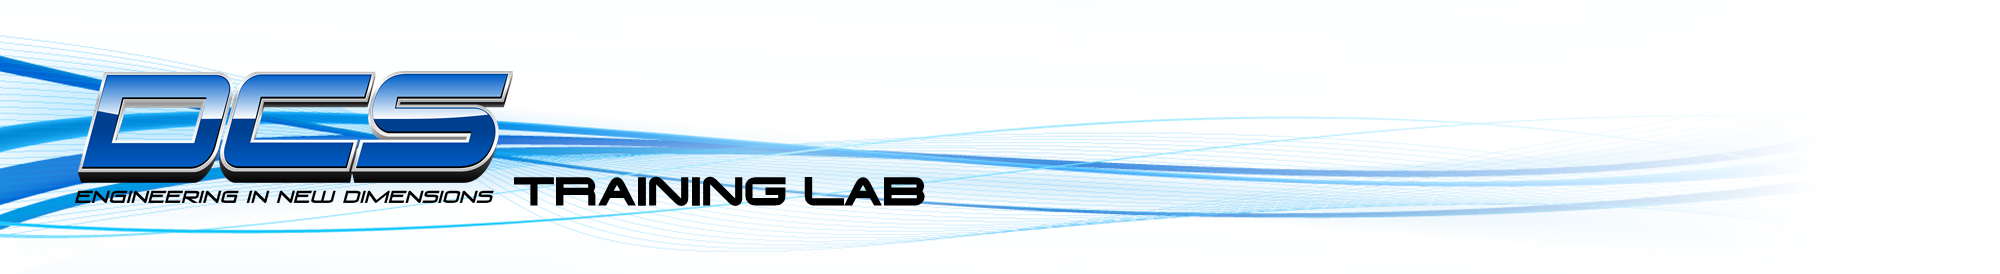 training-lab-logo-1